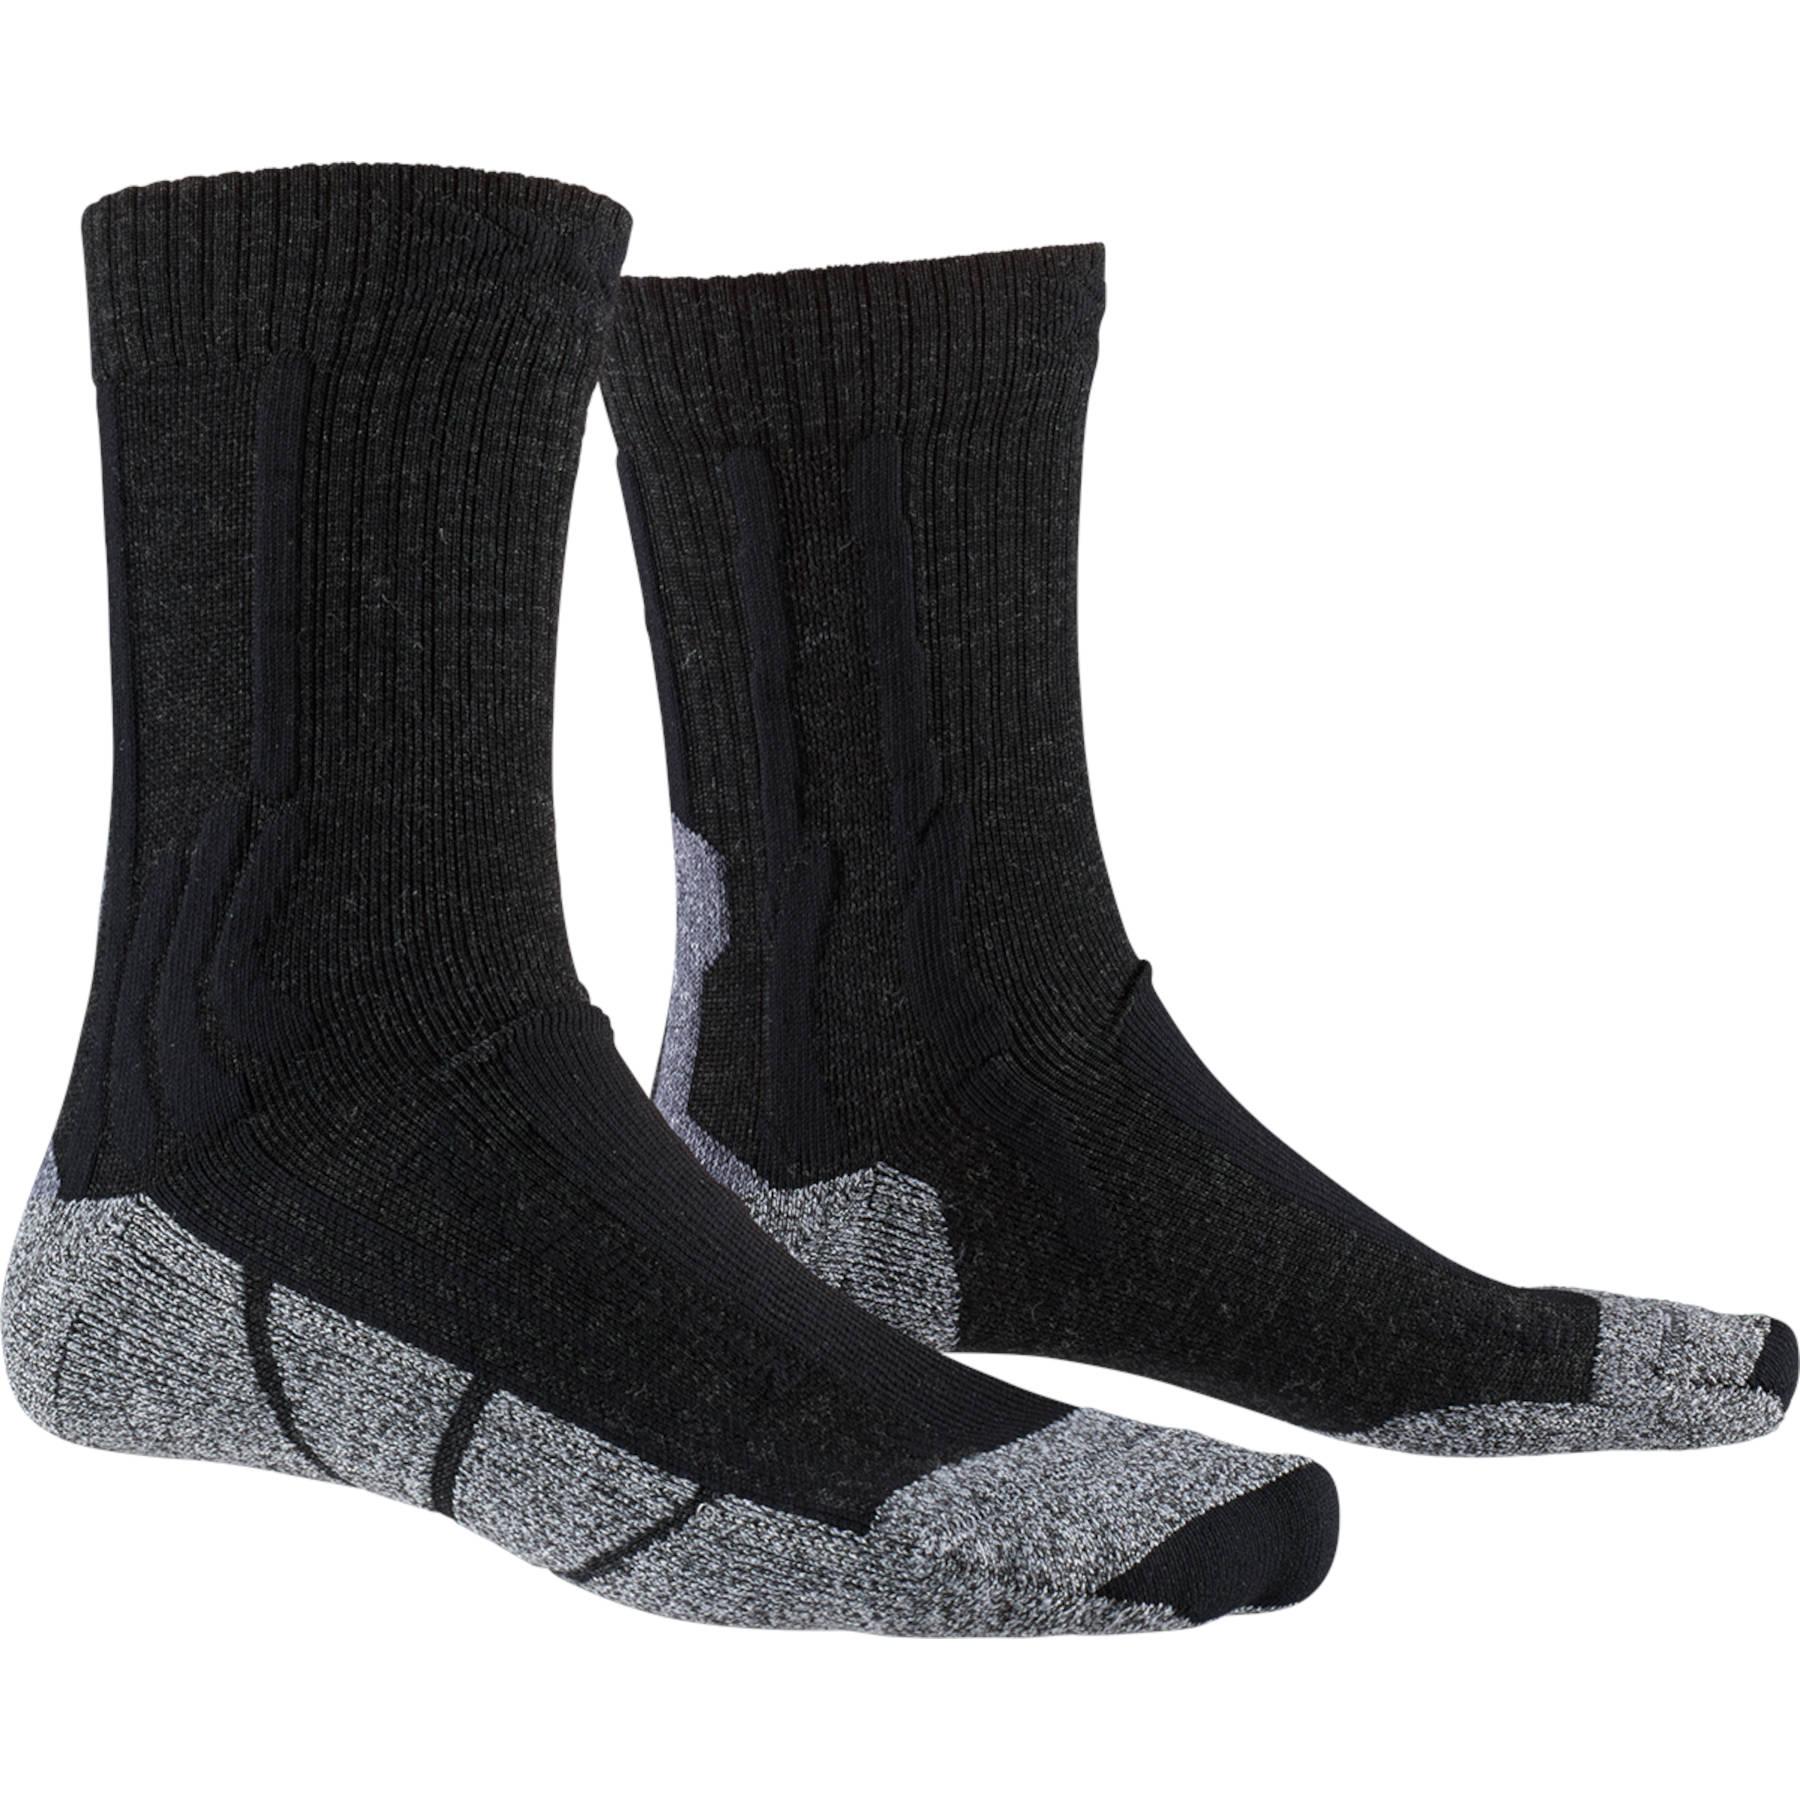 X-Socks Trekking Silver Women's Socks - opal black/dolomite grey melange